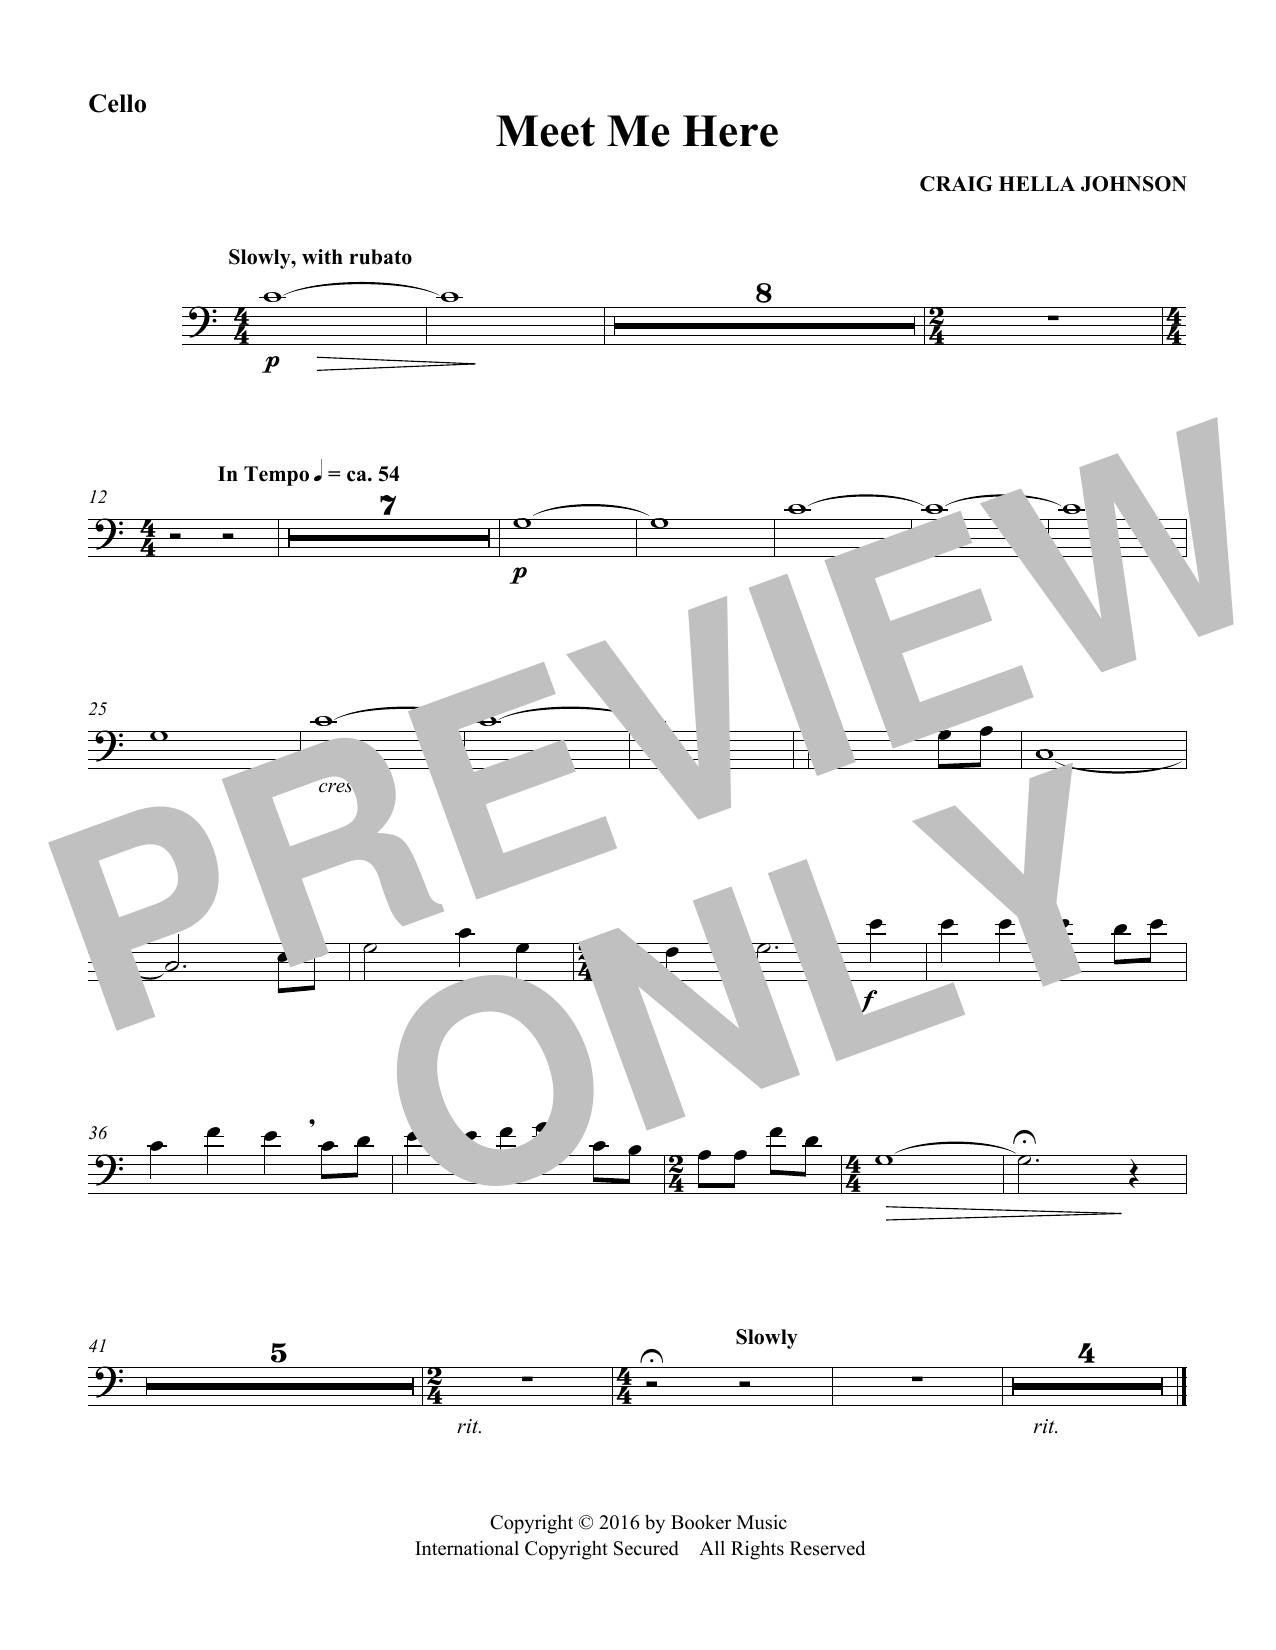 Meet Me Here (from Considering Matthew Shepard) - Cello Sheet Music